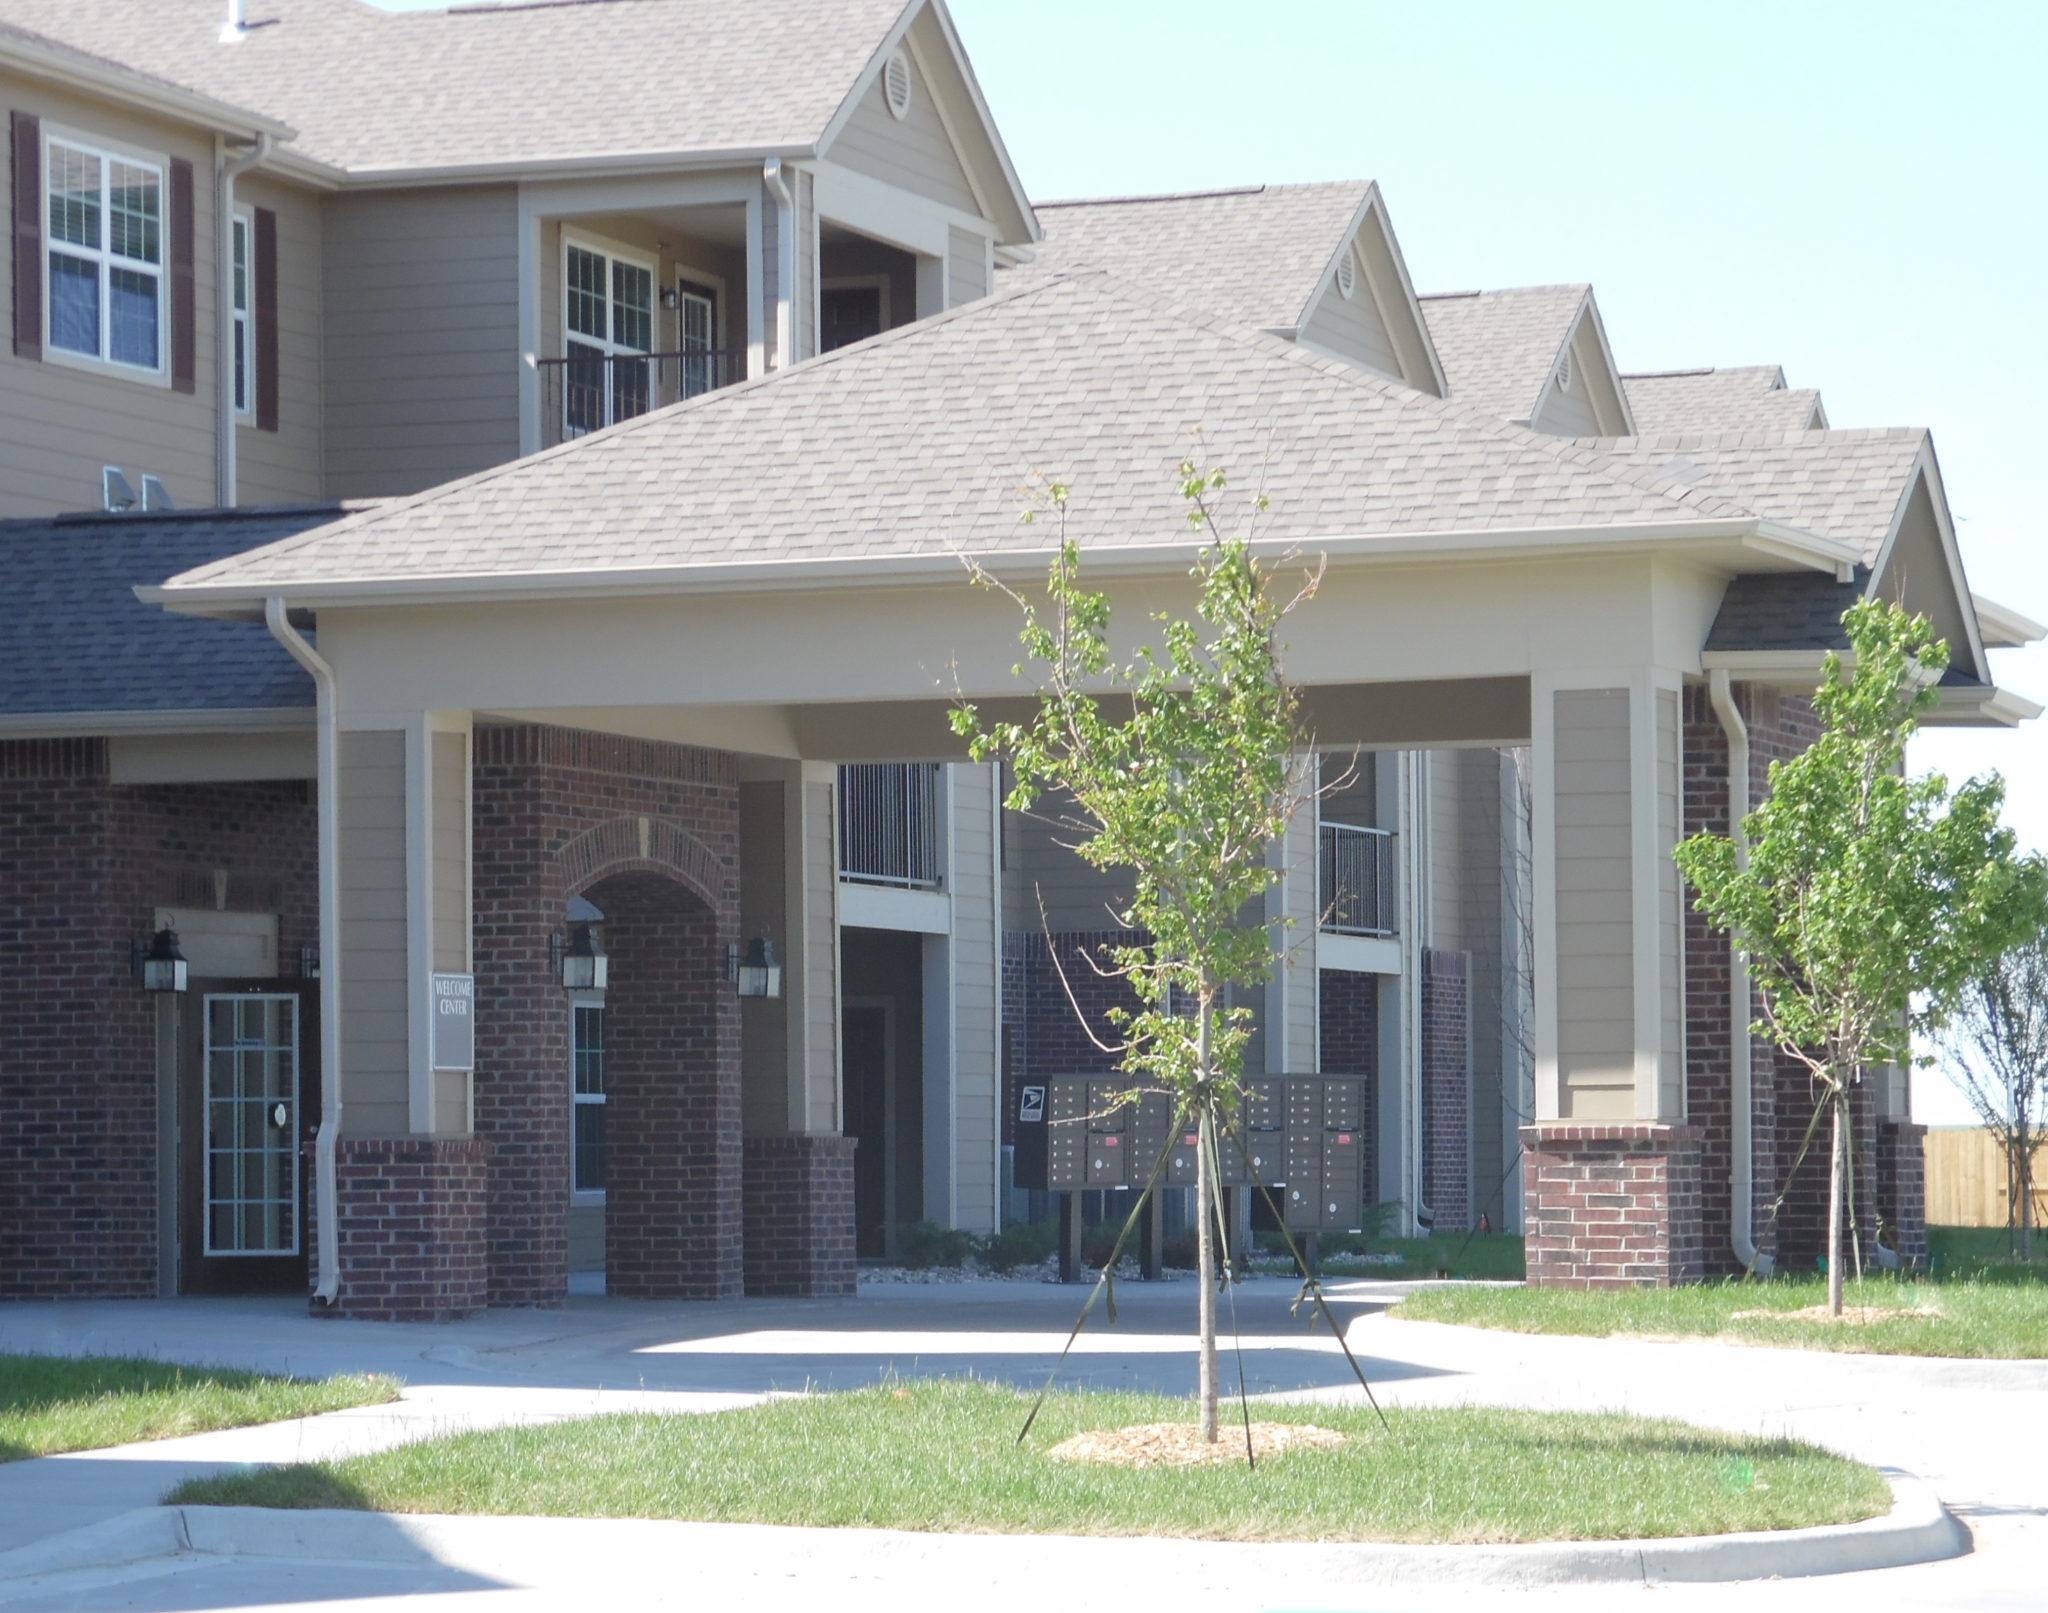 Birchwood Villas Manahattan KS Welcome Center2